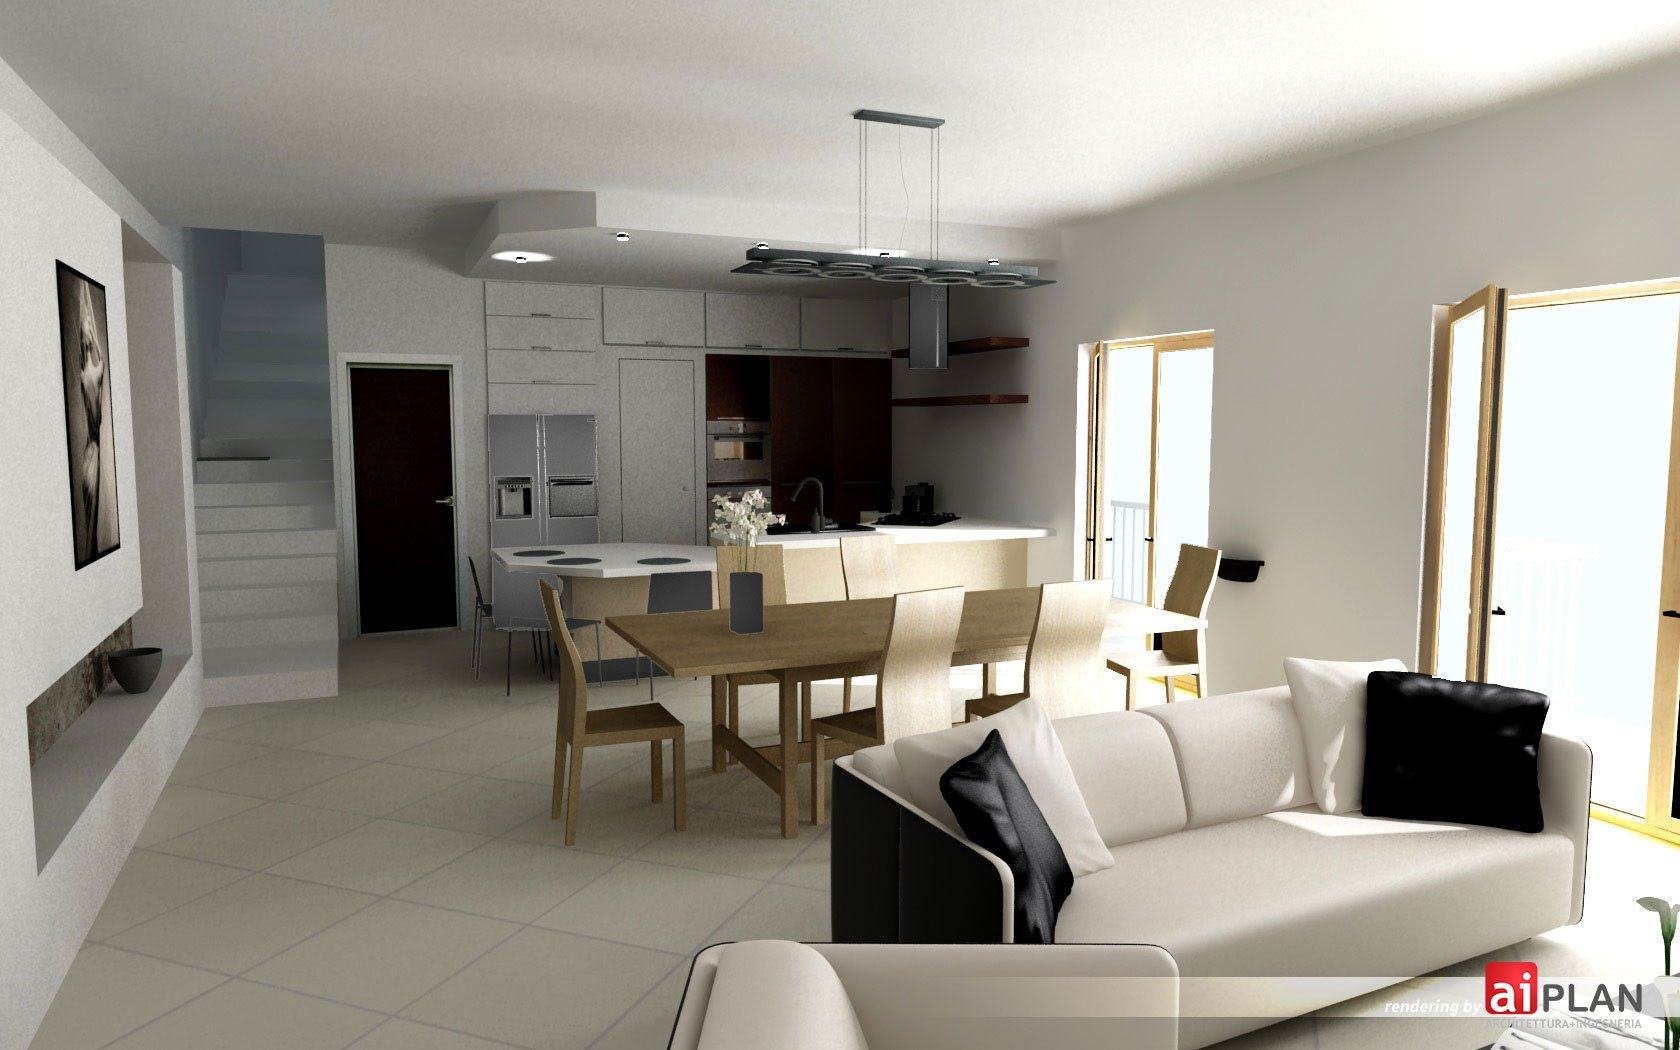 interni di residenze - Aiplan - architettura e ingegneria